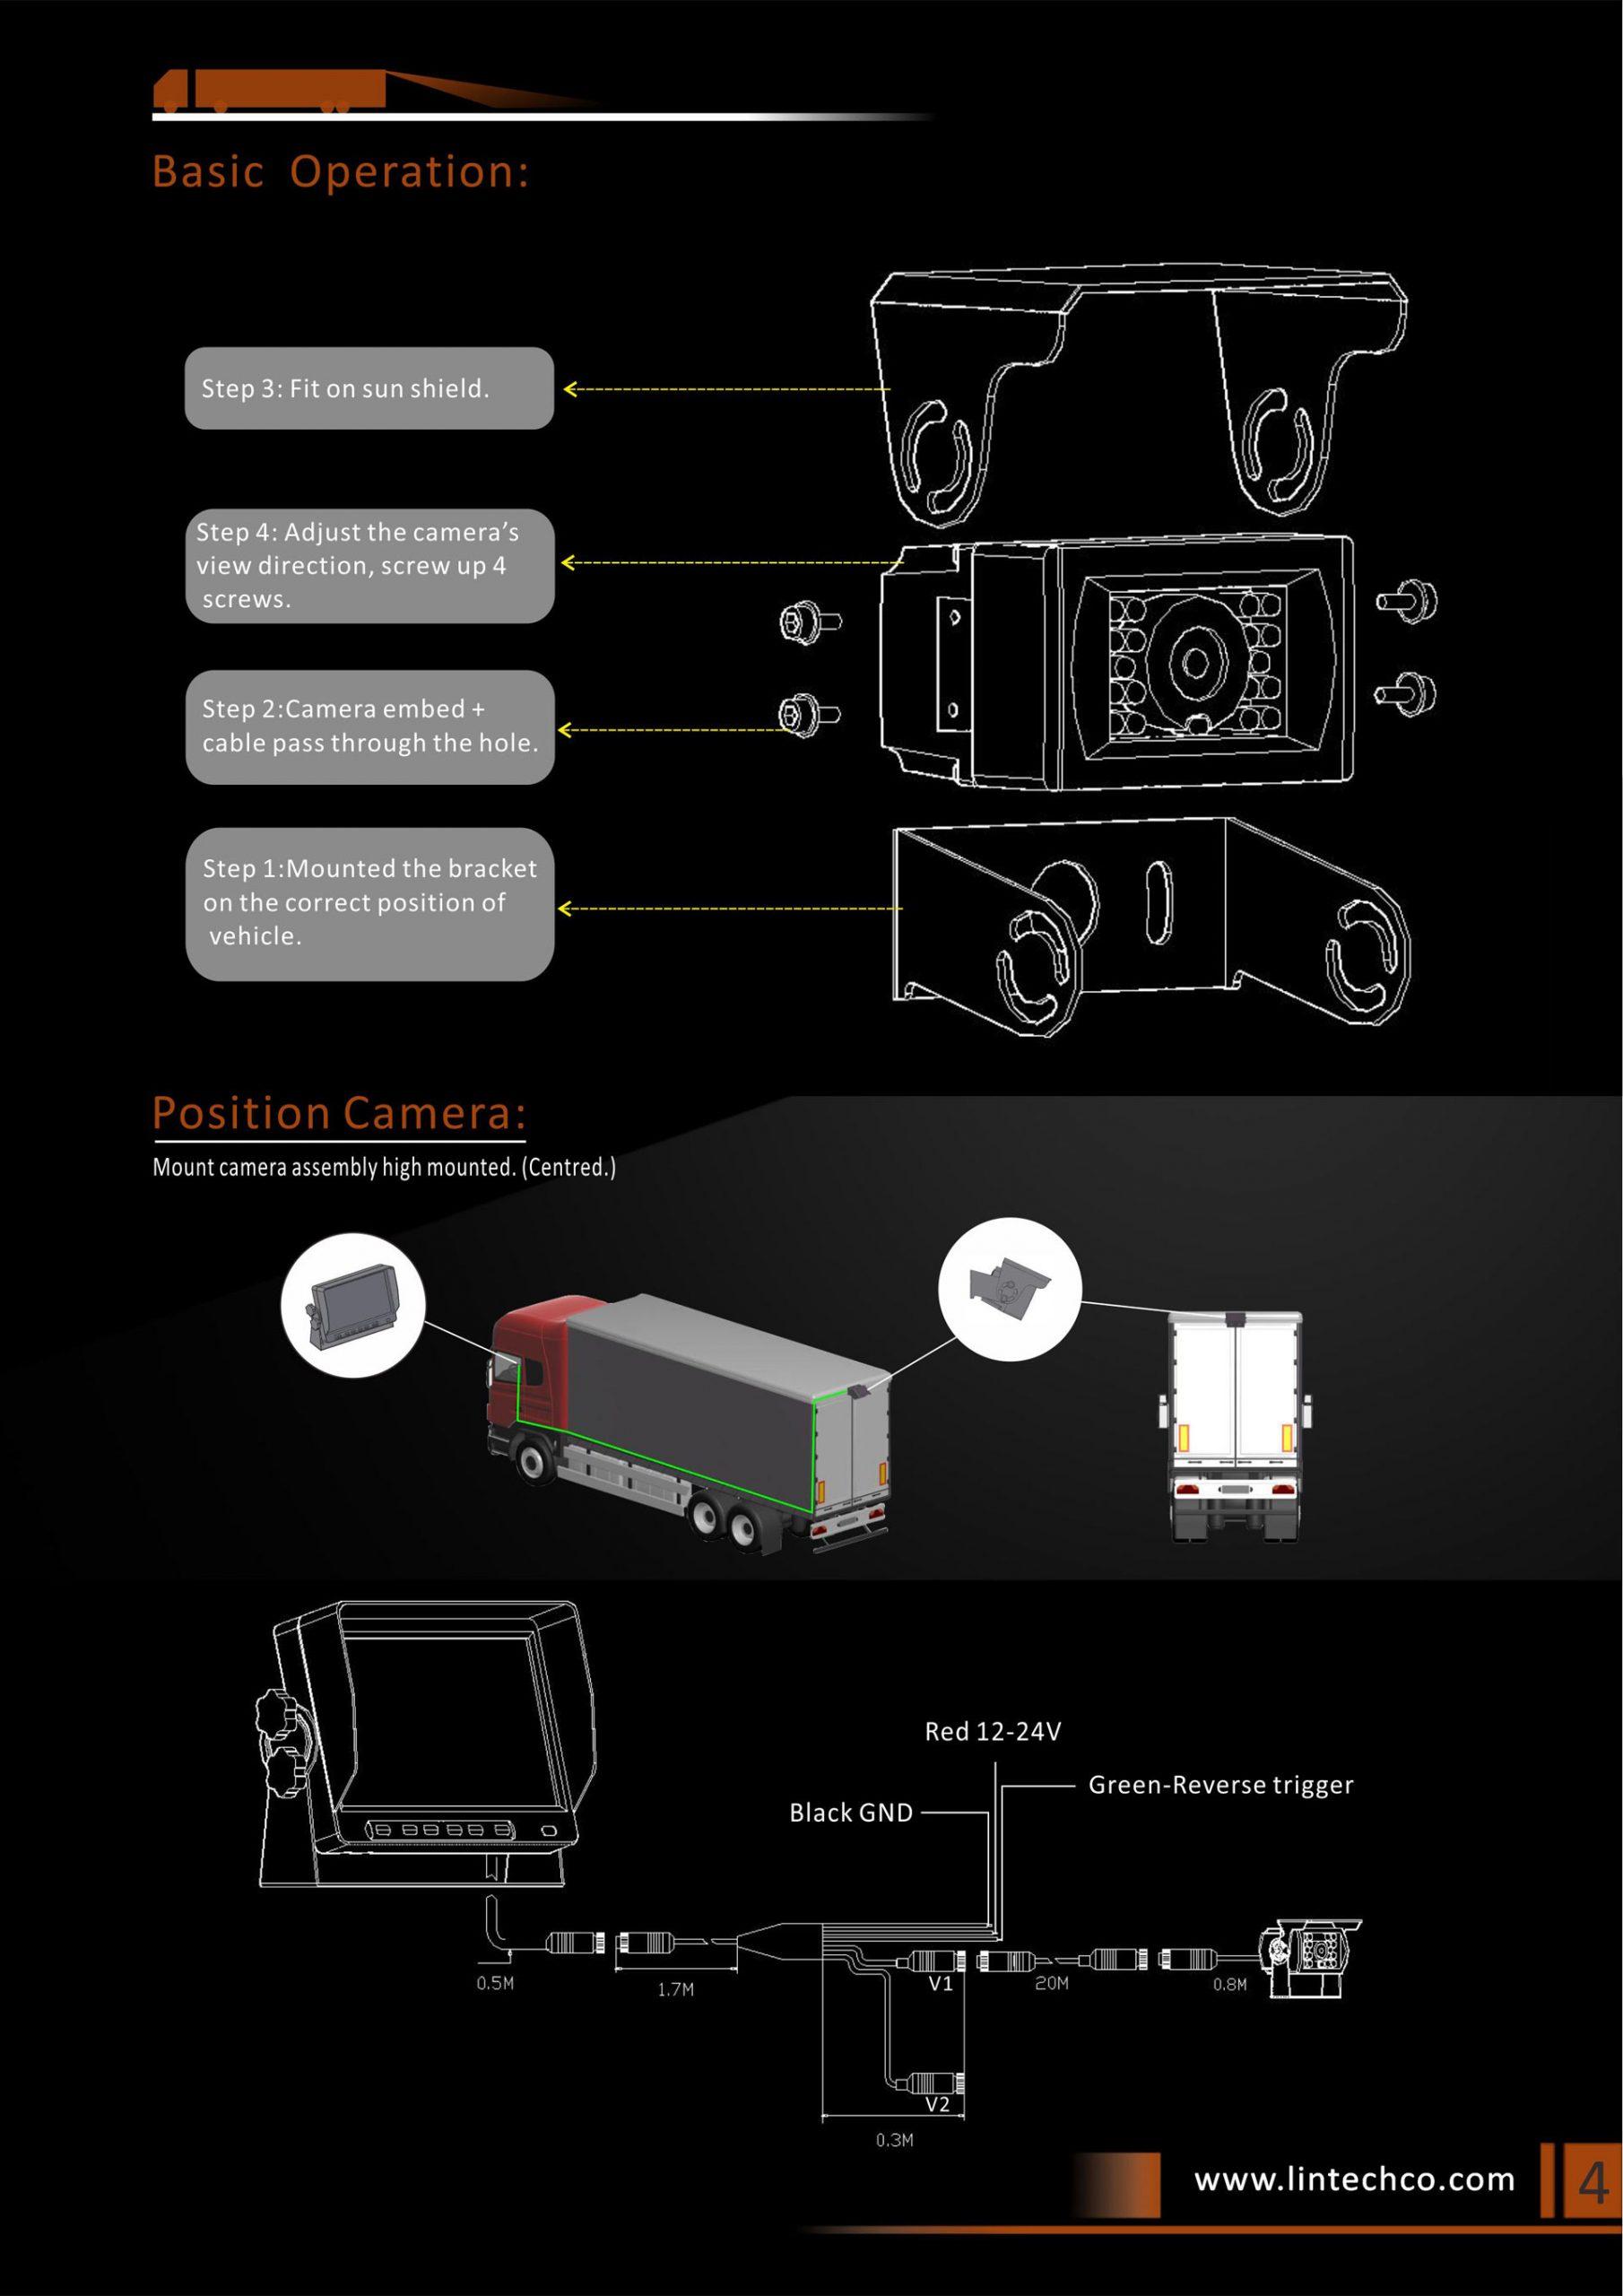 4.Heavy-Duty-18pcs-IR-LED-Night-Vision-IP69K-Waterproof-Backup-Camera